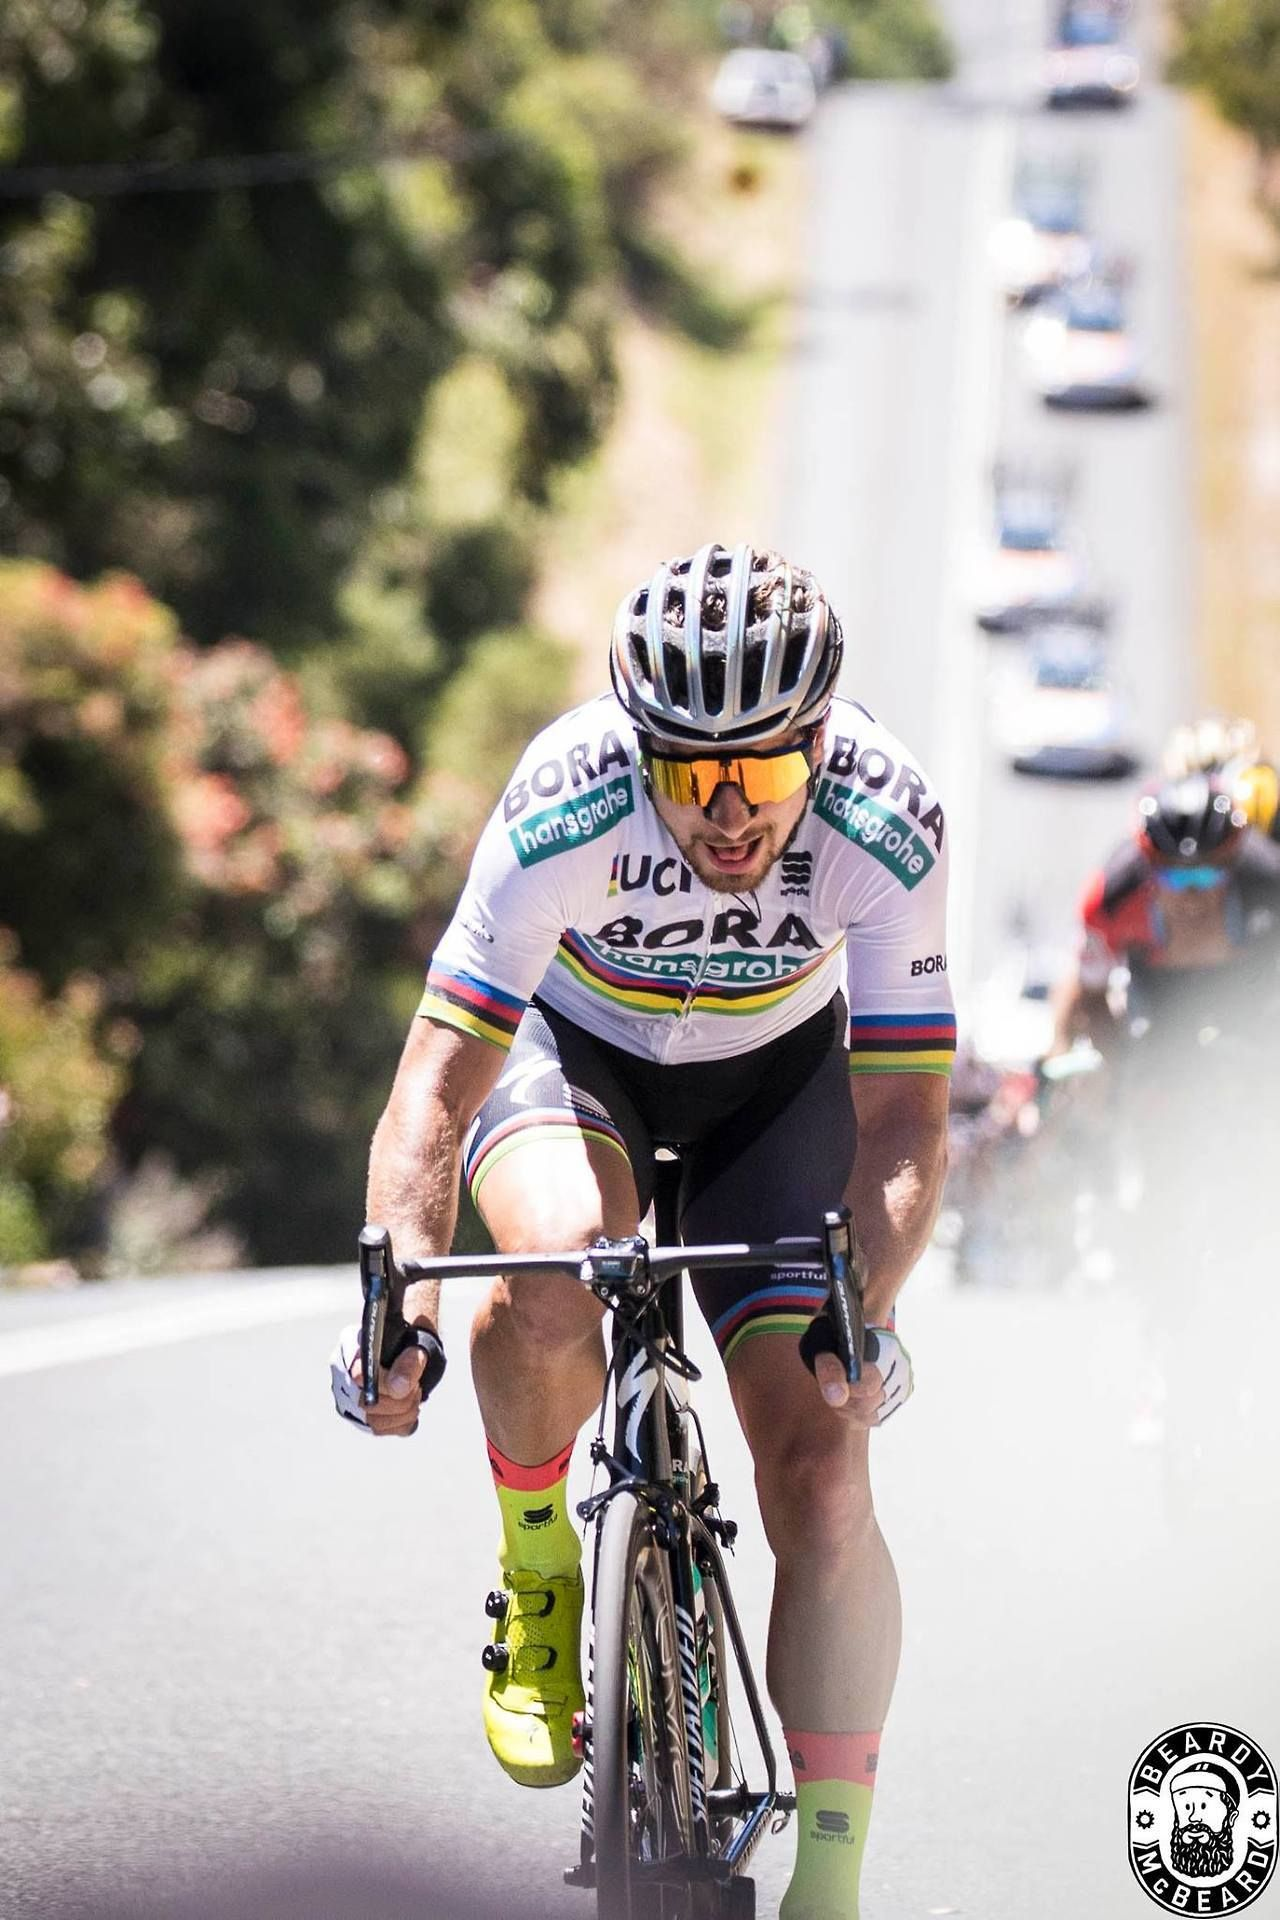 Peter Sagan Stage 4 Tdu 2018 Photo Credit Beardy Mcbeard